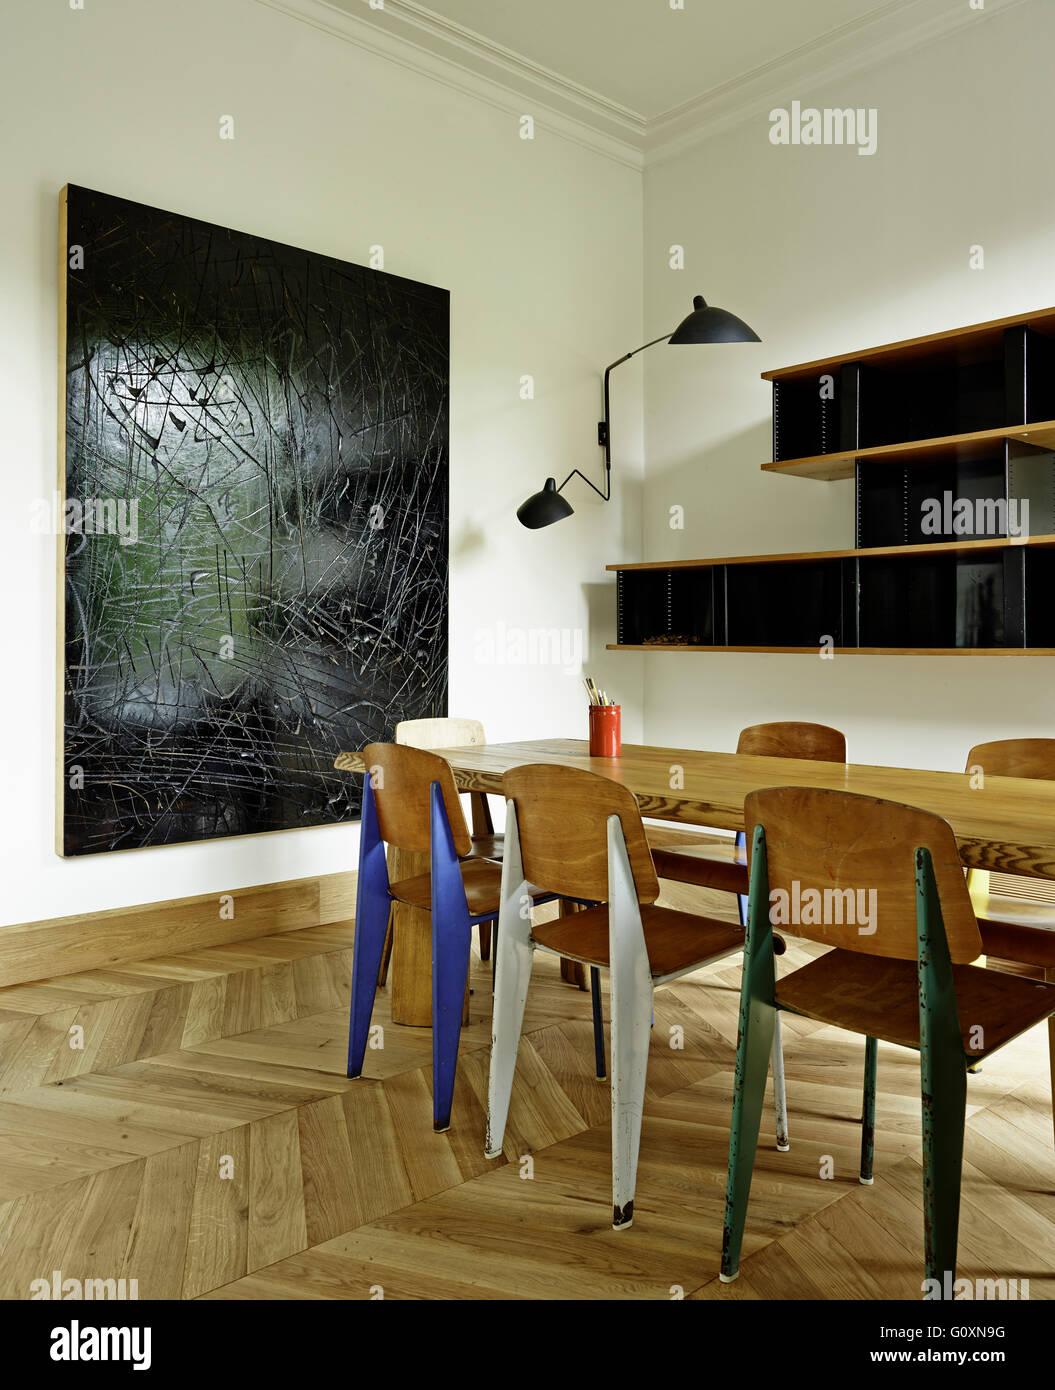 Apartamento MA, Barcelona, España. Madera moderna mesa de comedor y ...